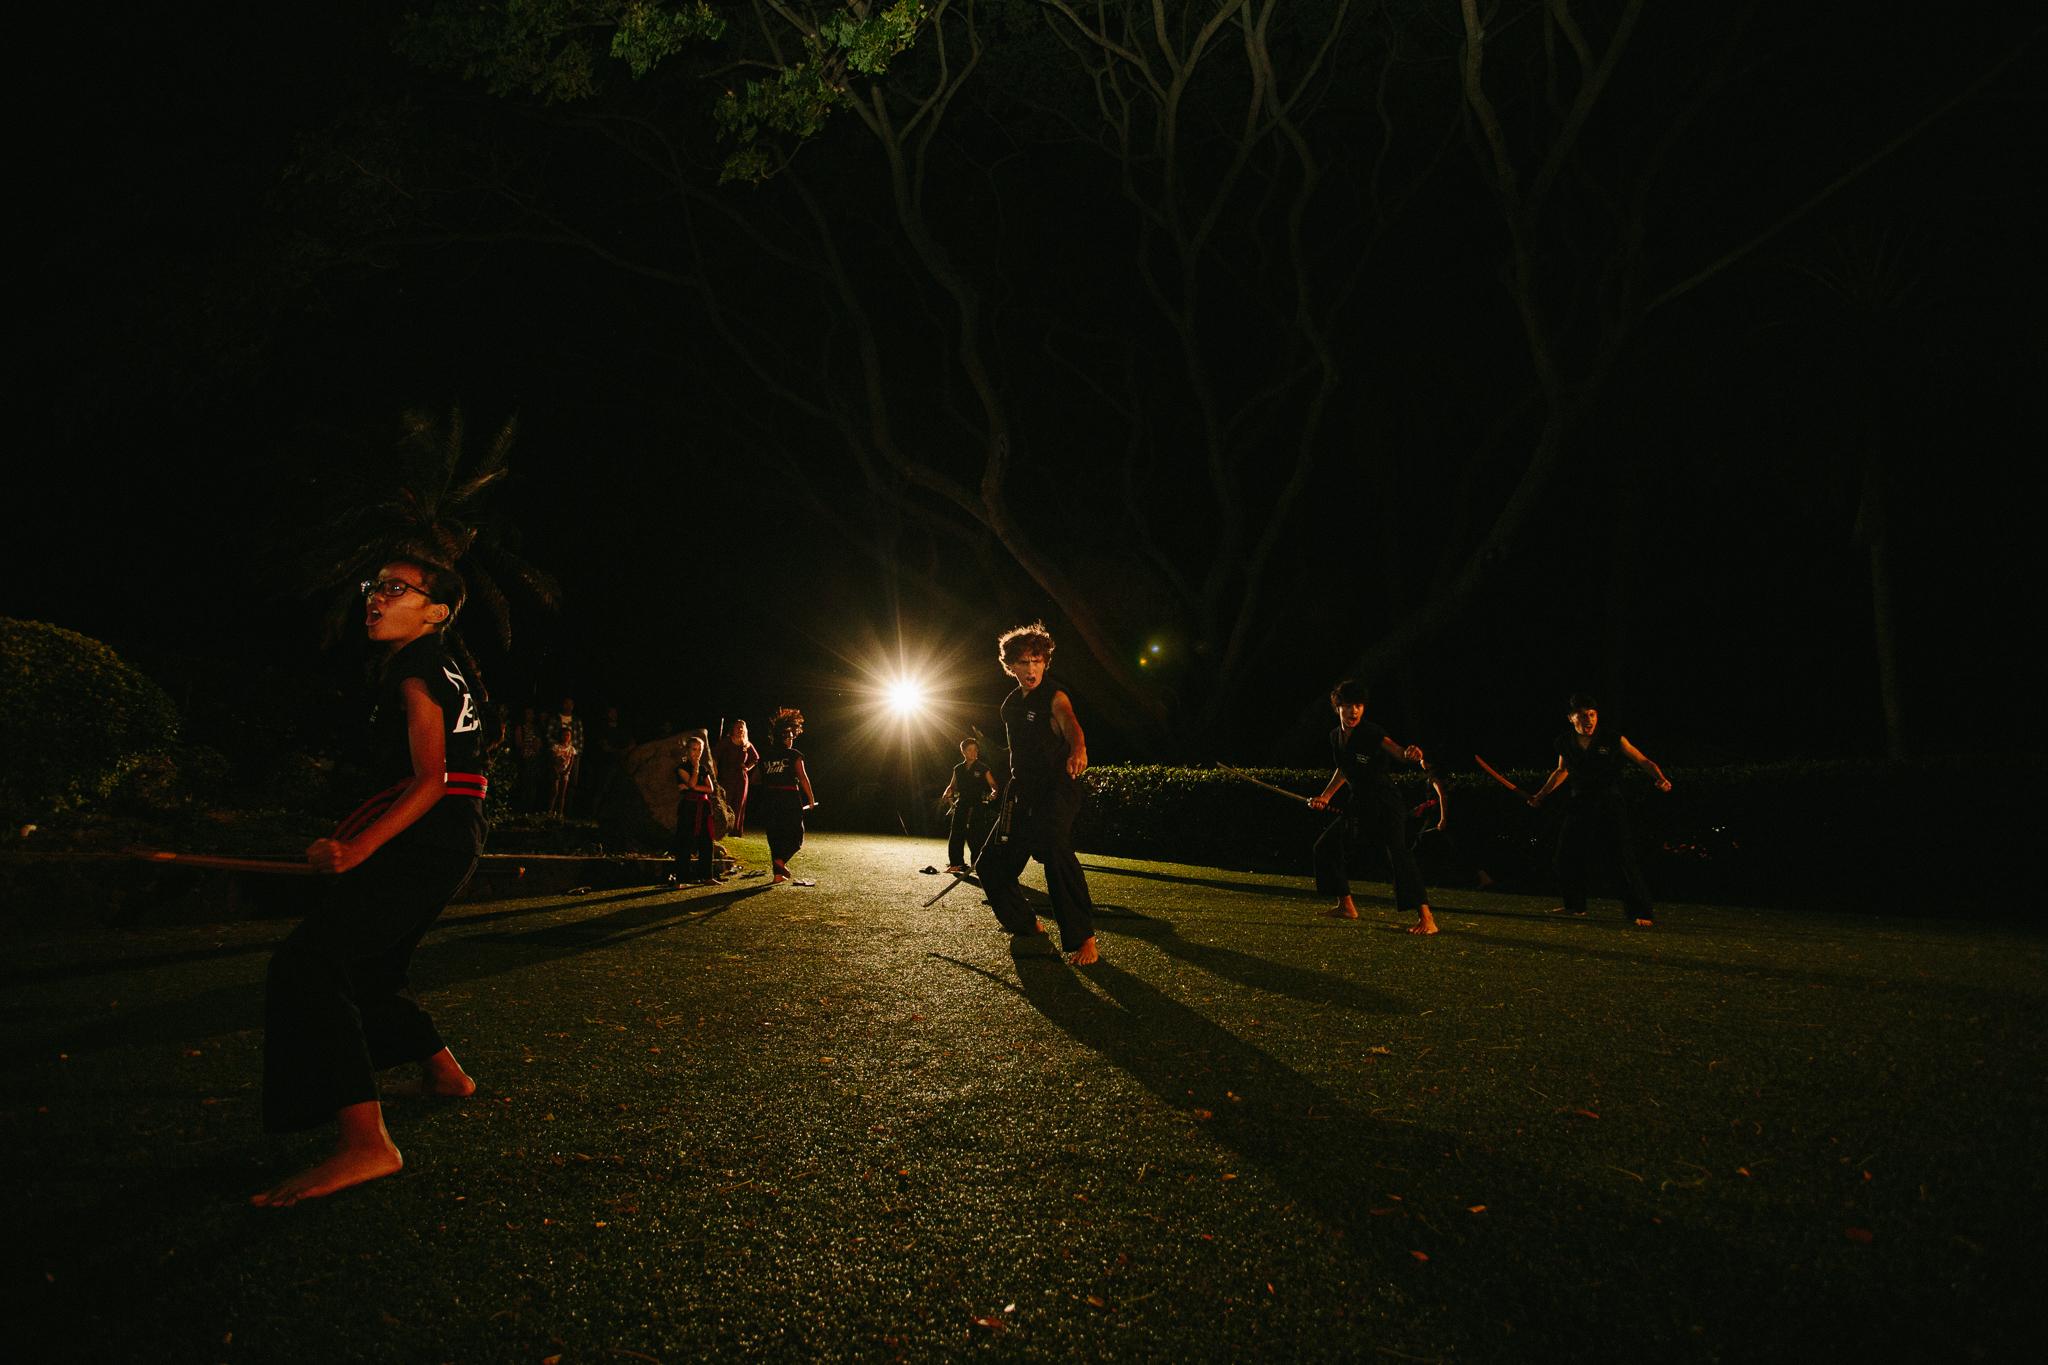 Kualoa_Ranch_Wedding_Photographer_Tone_Hawaii-37.jpg